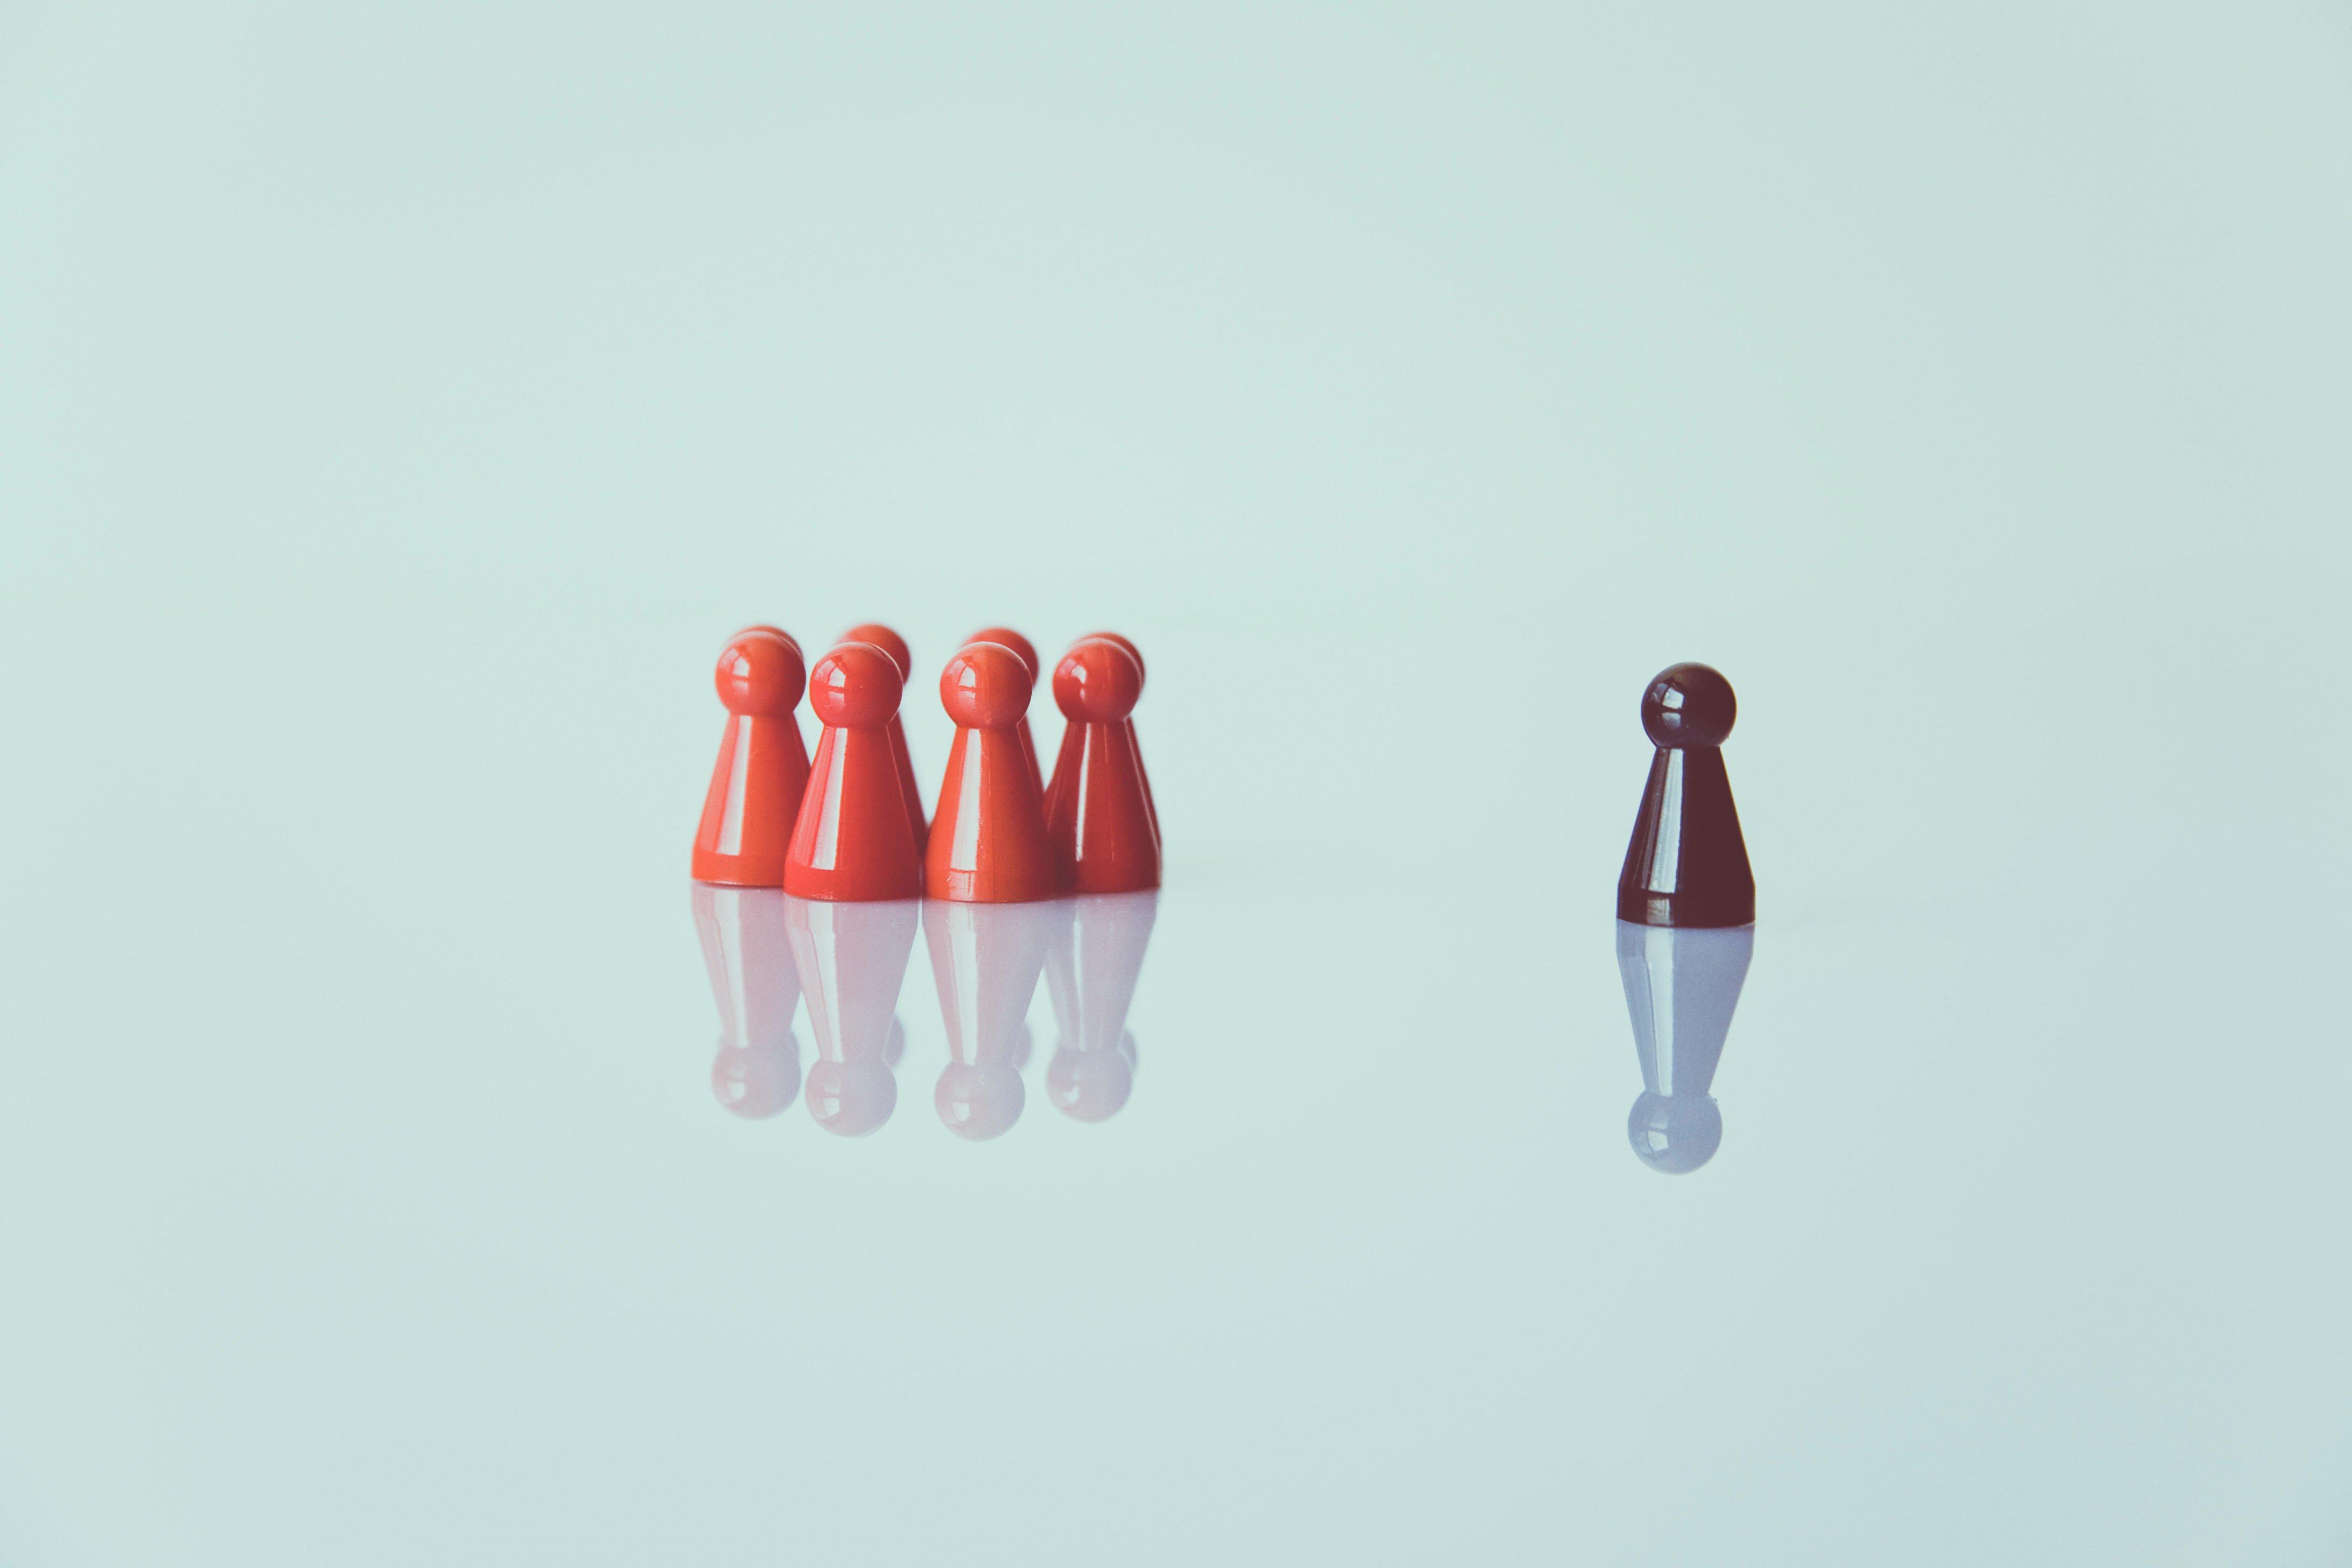 CEOs are not like us - horizontal